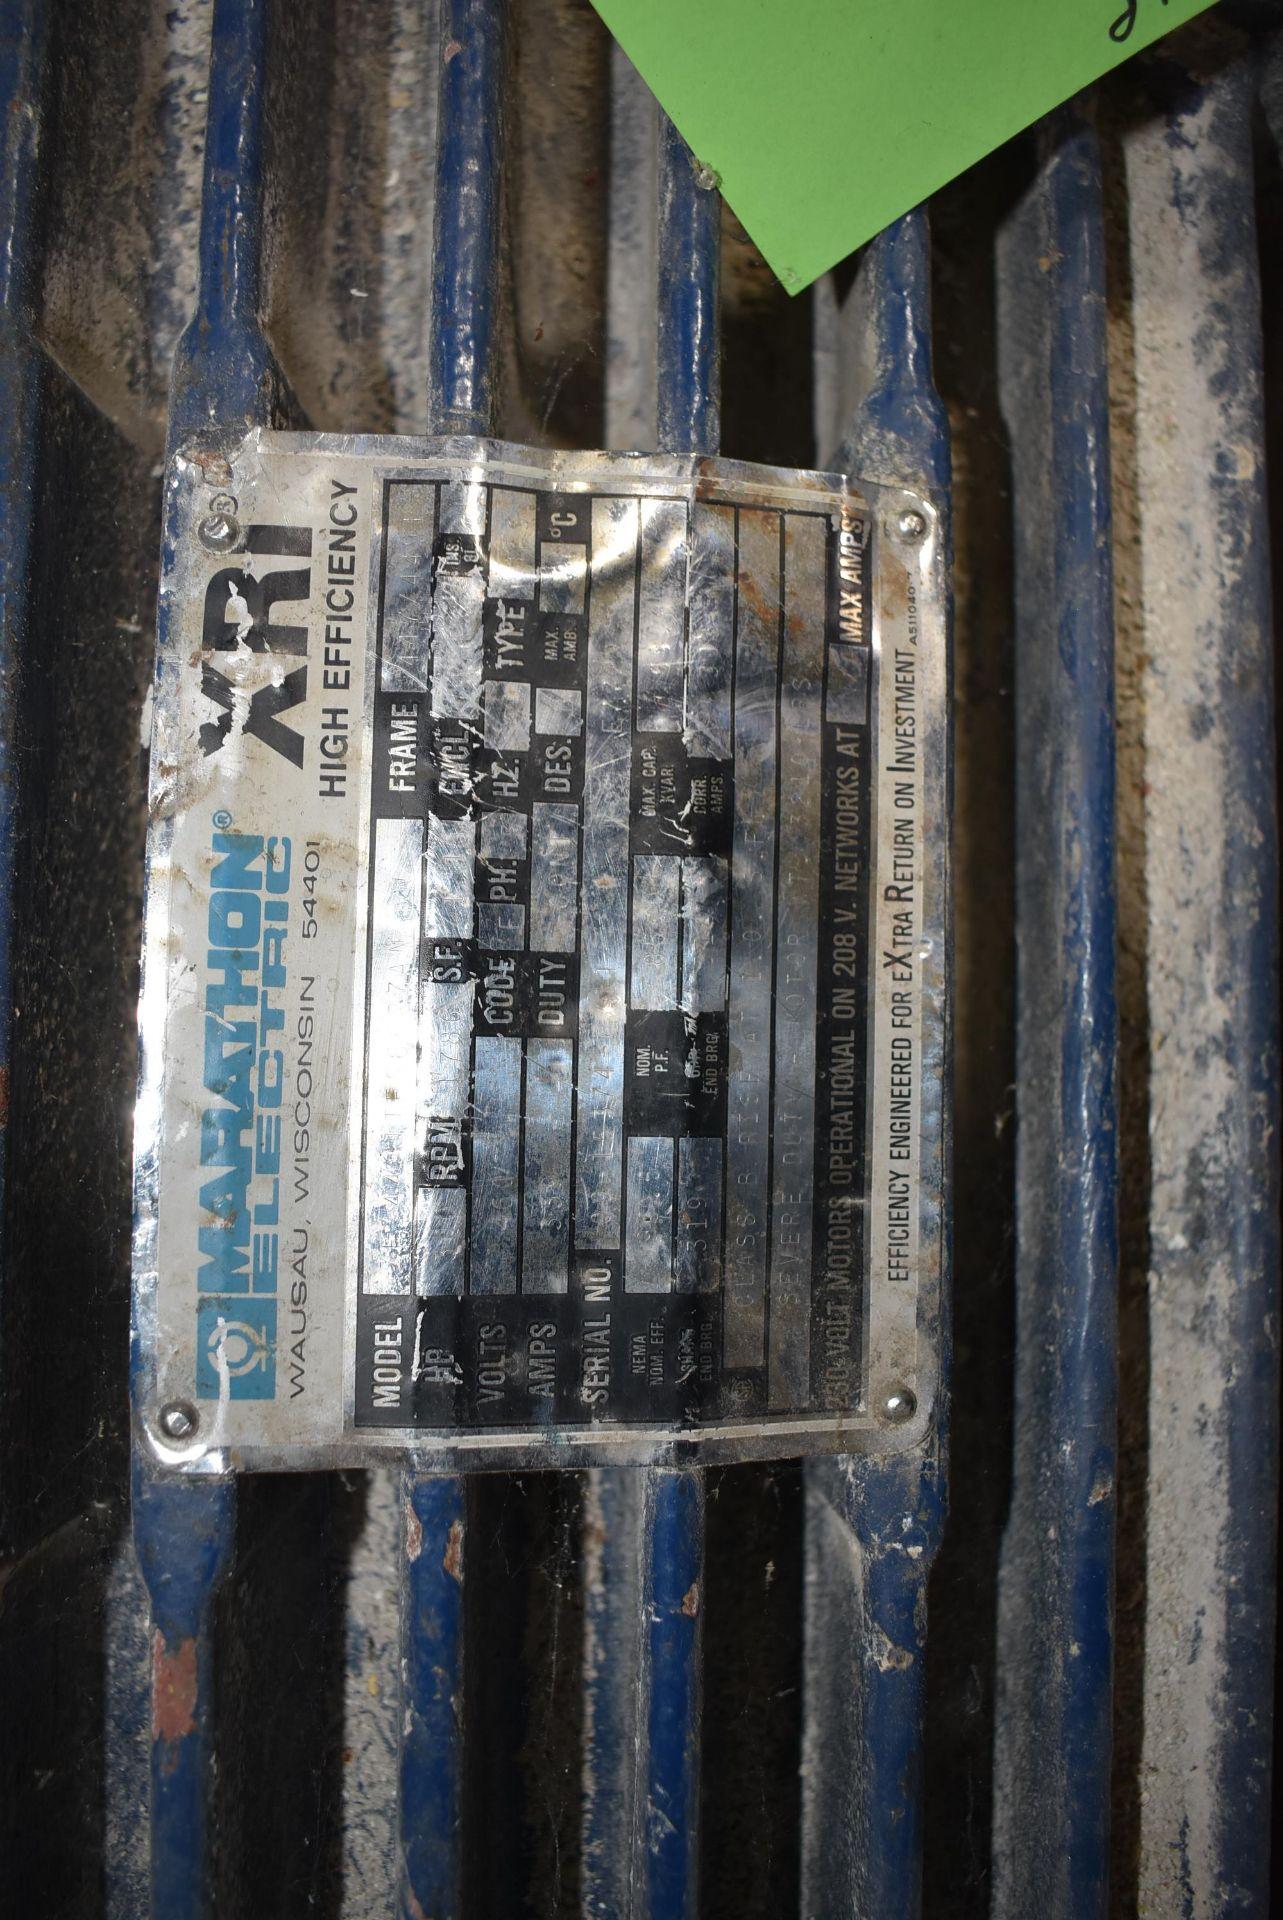 Marathon XRI 300 HP Motor, Frame 447/449T - Image 3 of 3